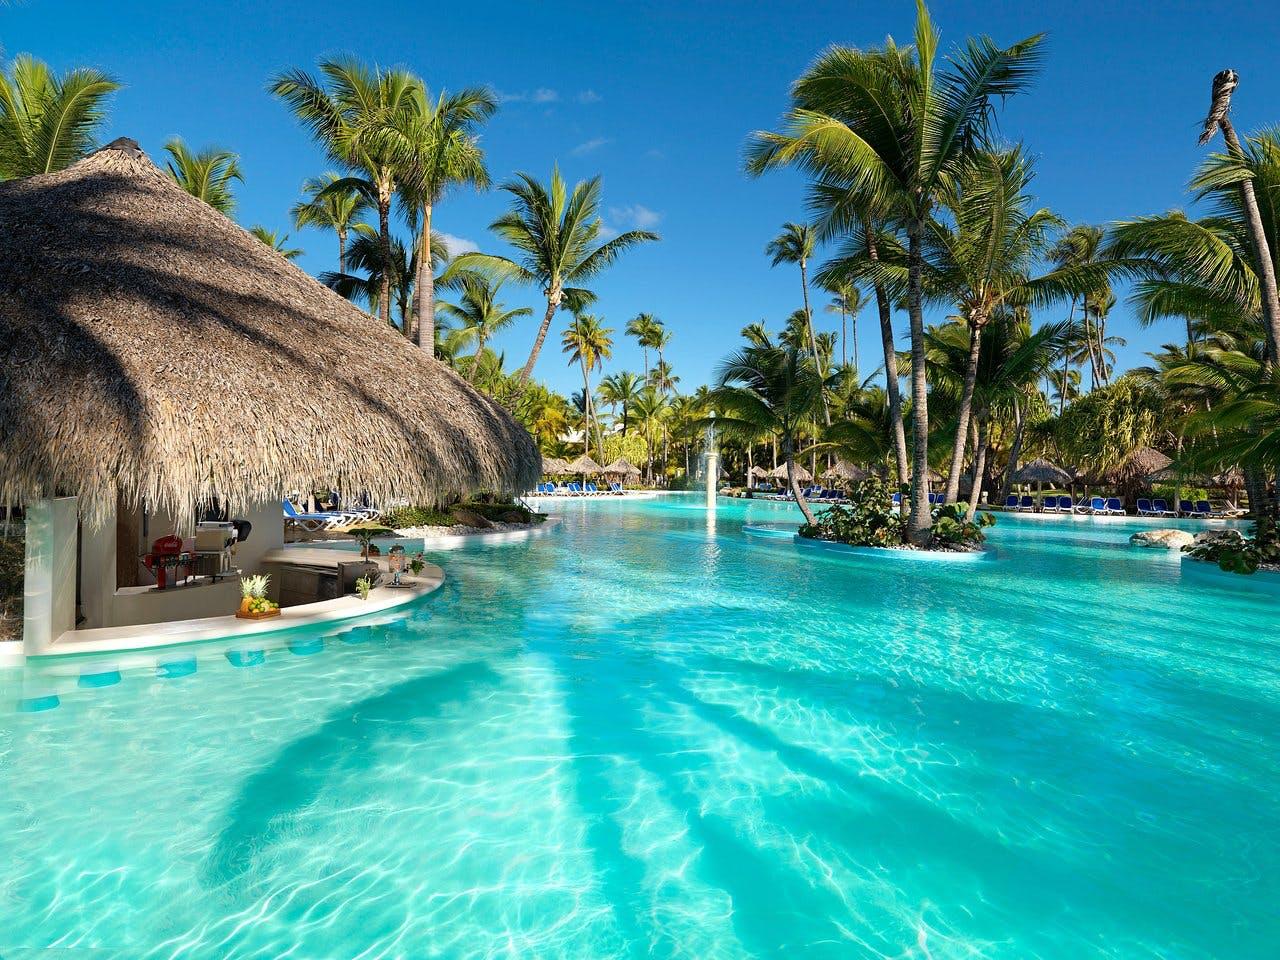 Meliá Caribe Beach Resort pool